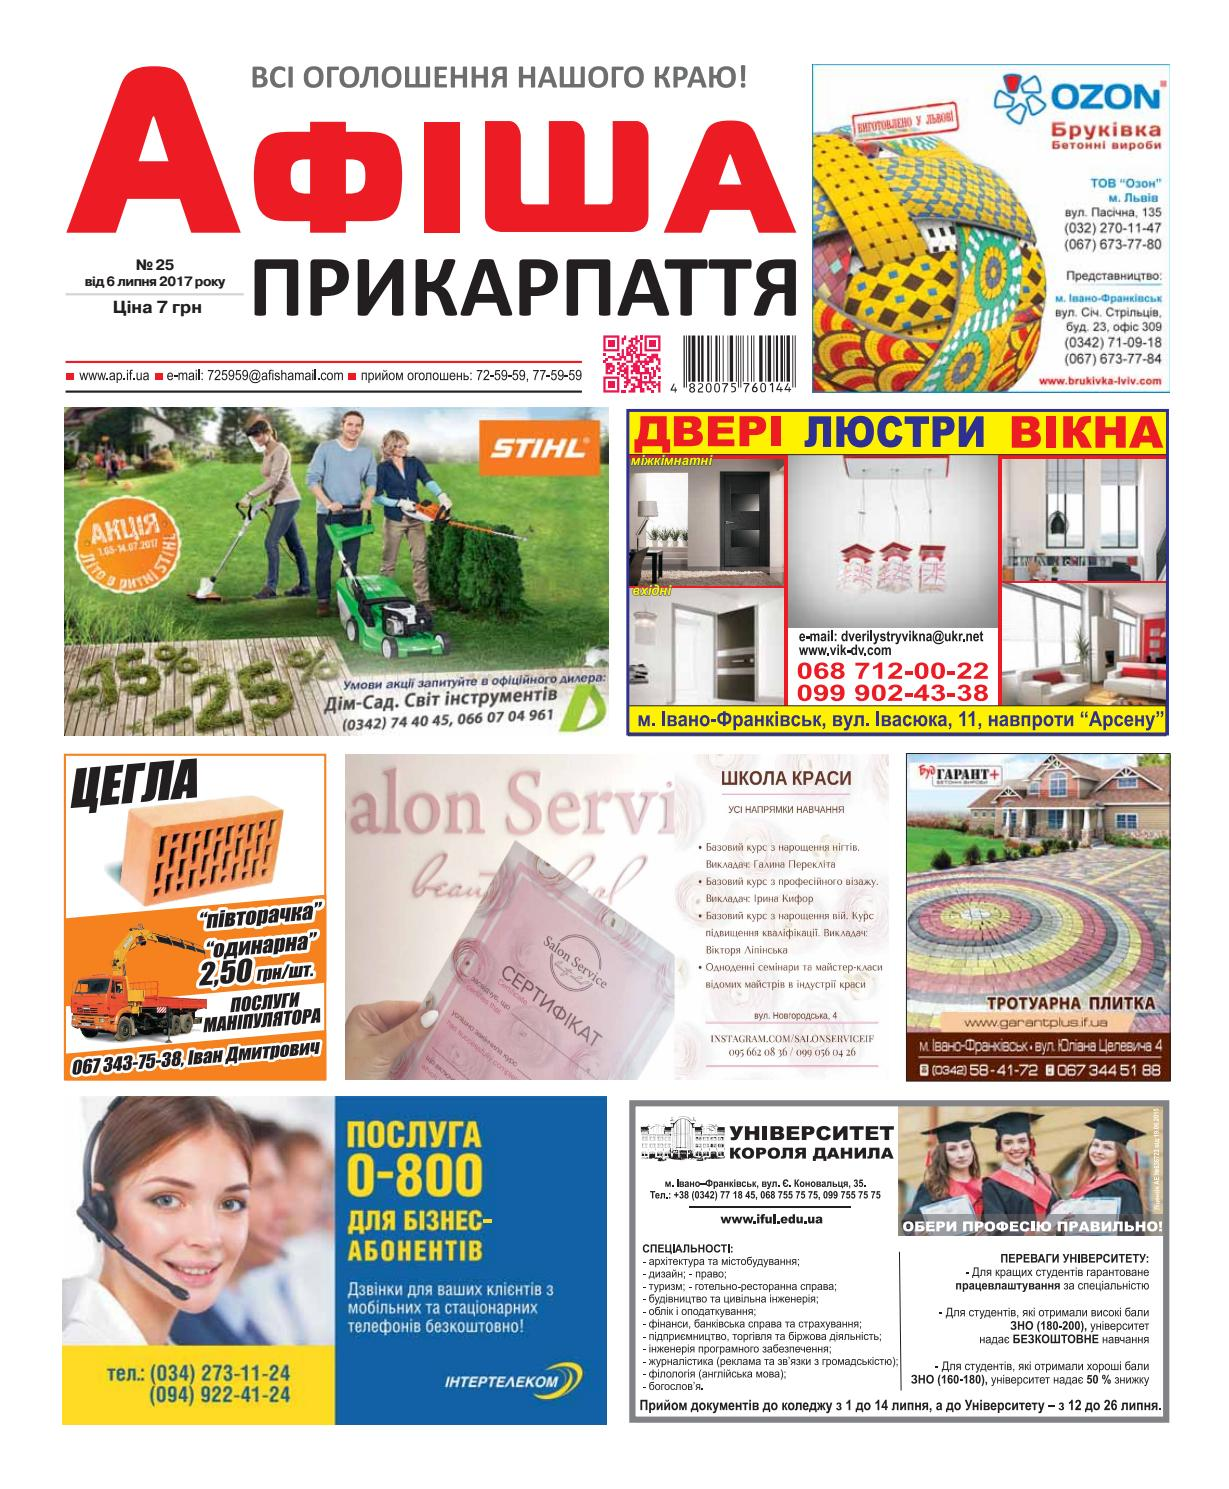 Афіша Прикарпаття 25 by Olya Olya - issuu b3d978a23798d